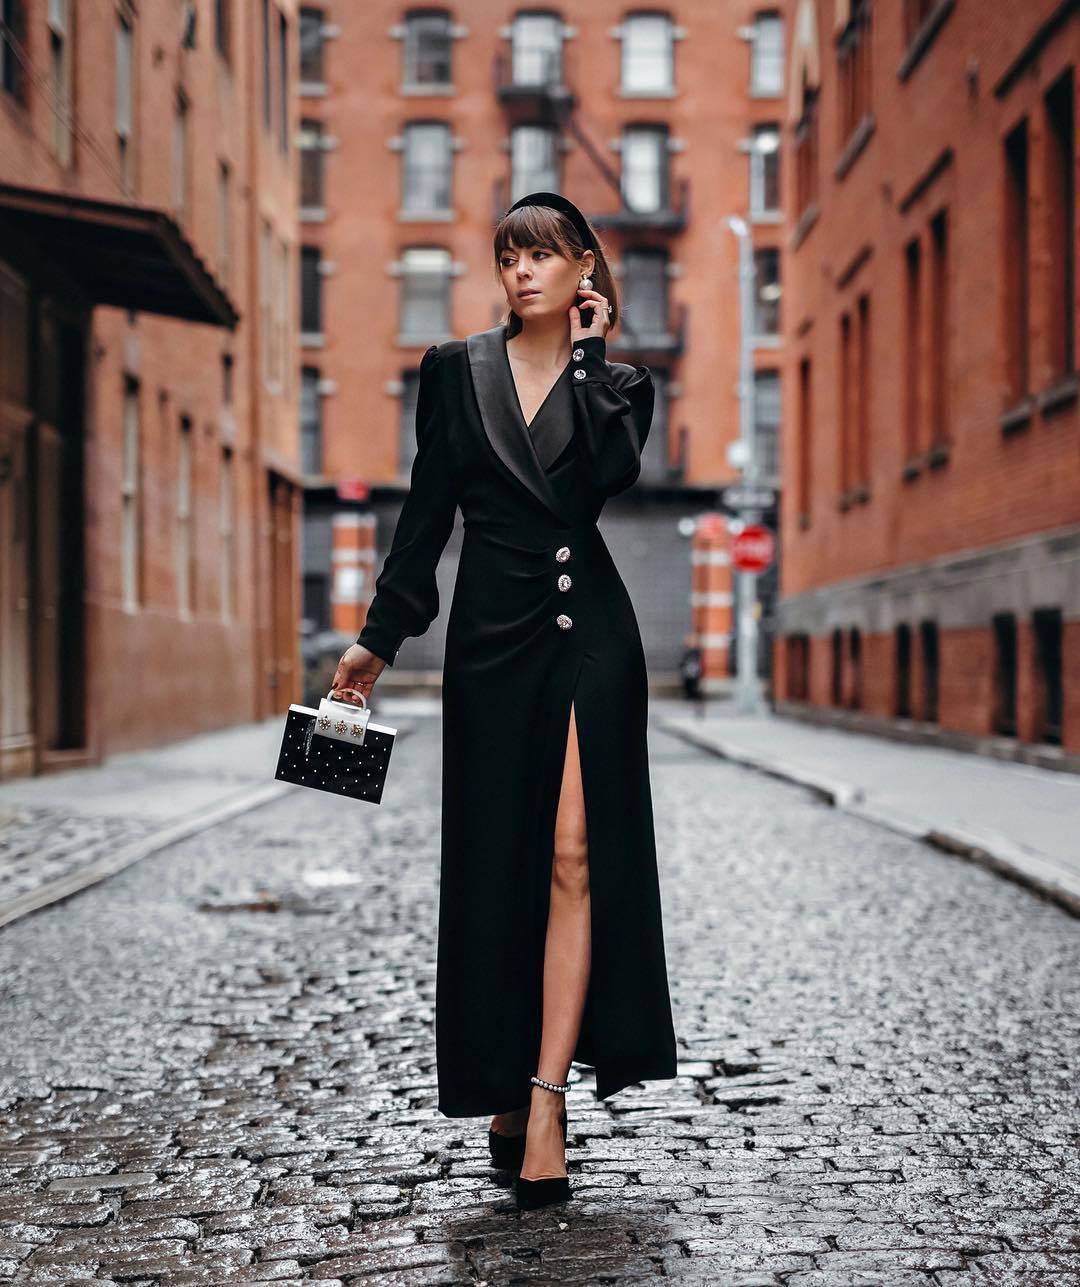 dress maxi dress black dress slit dress long sleeve dress v neck dress black bag handbag pumps